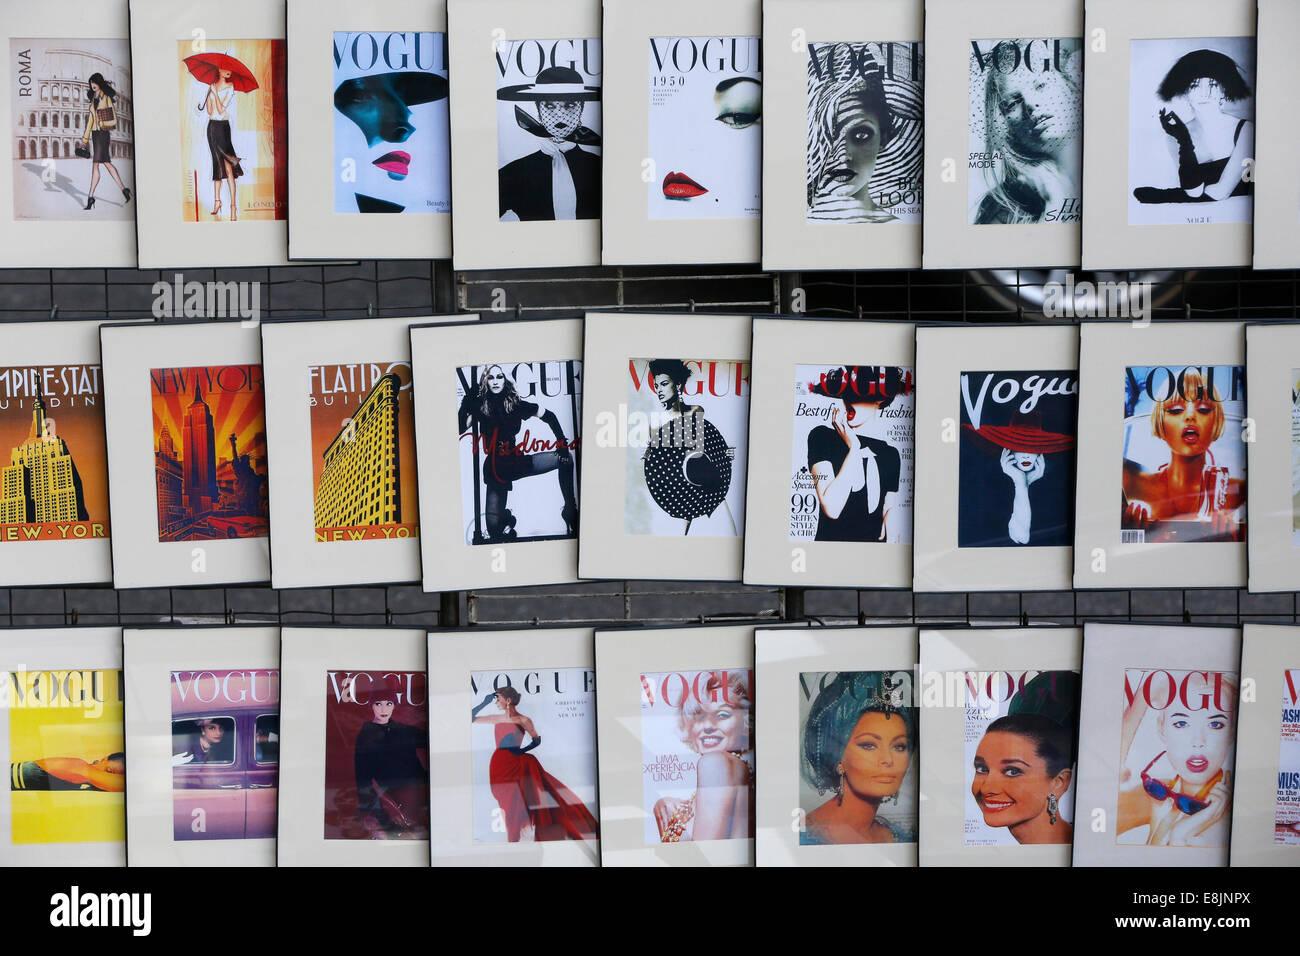 Magazine vogue. Photo Stock